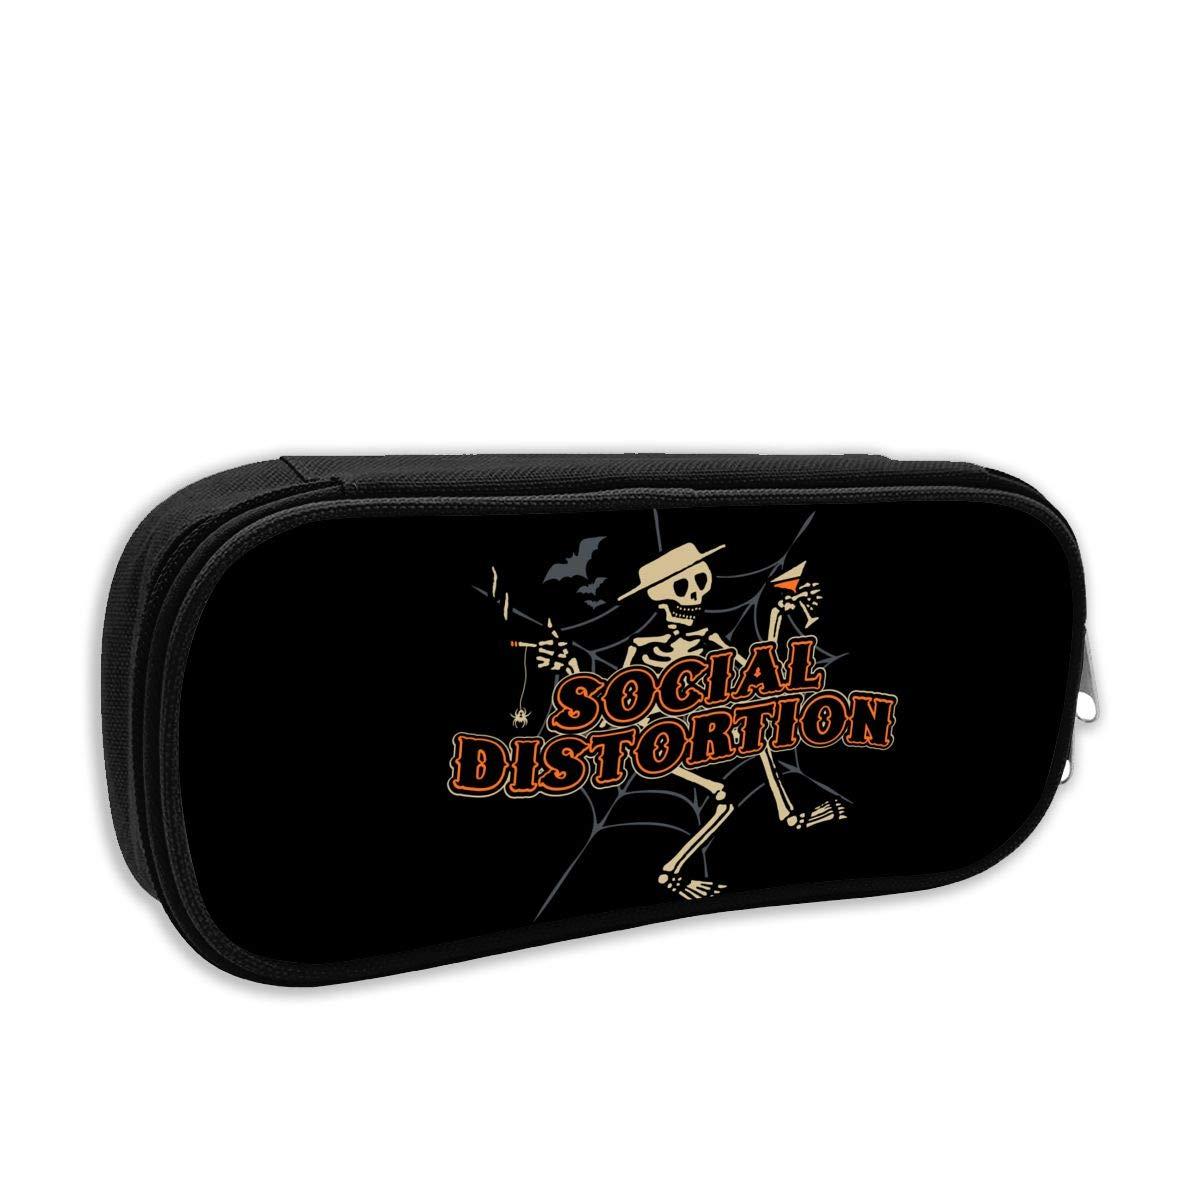 NaohBent Social Distortion New Pencil Case Stationery Bag Fashion Storage Bag Sorting Bag Coin Bag Cosmetic Bag